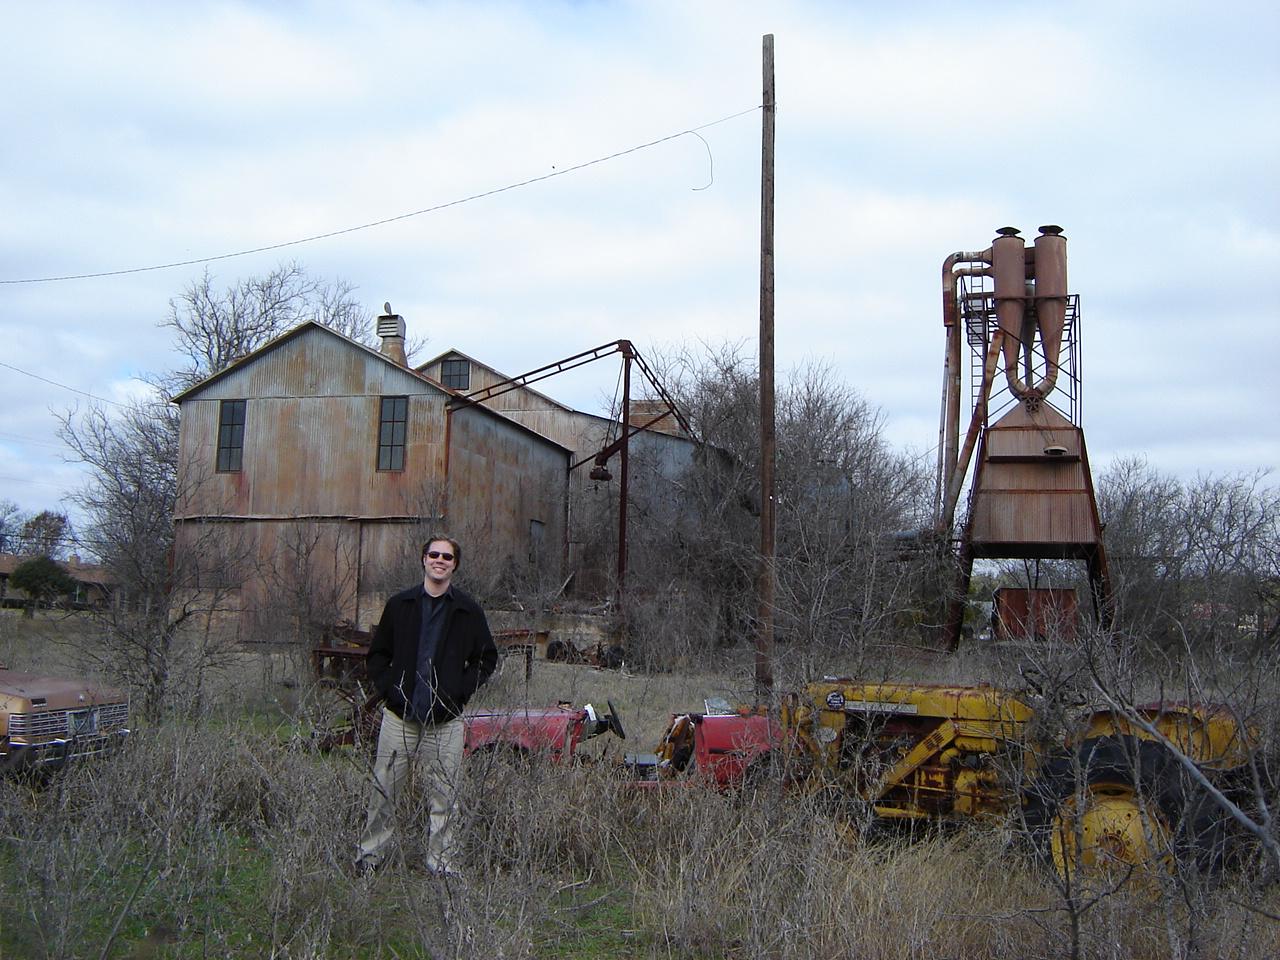 Texas Chainsaw Massacre House 1974